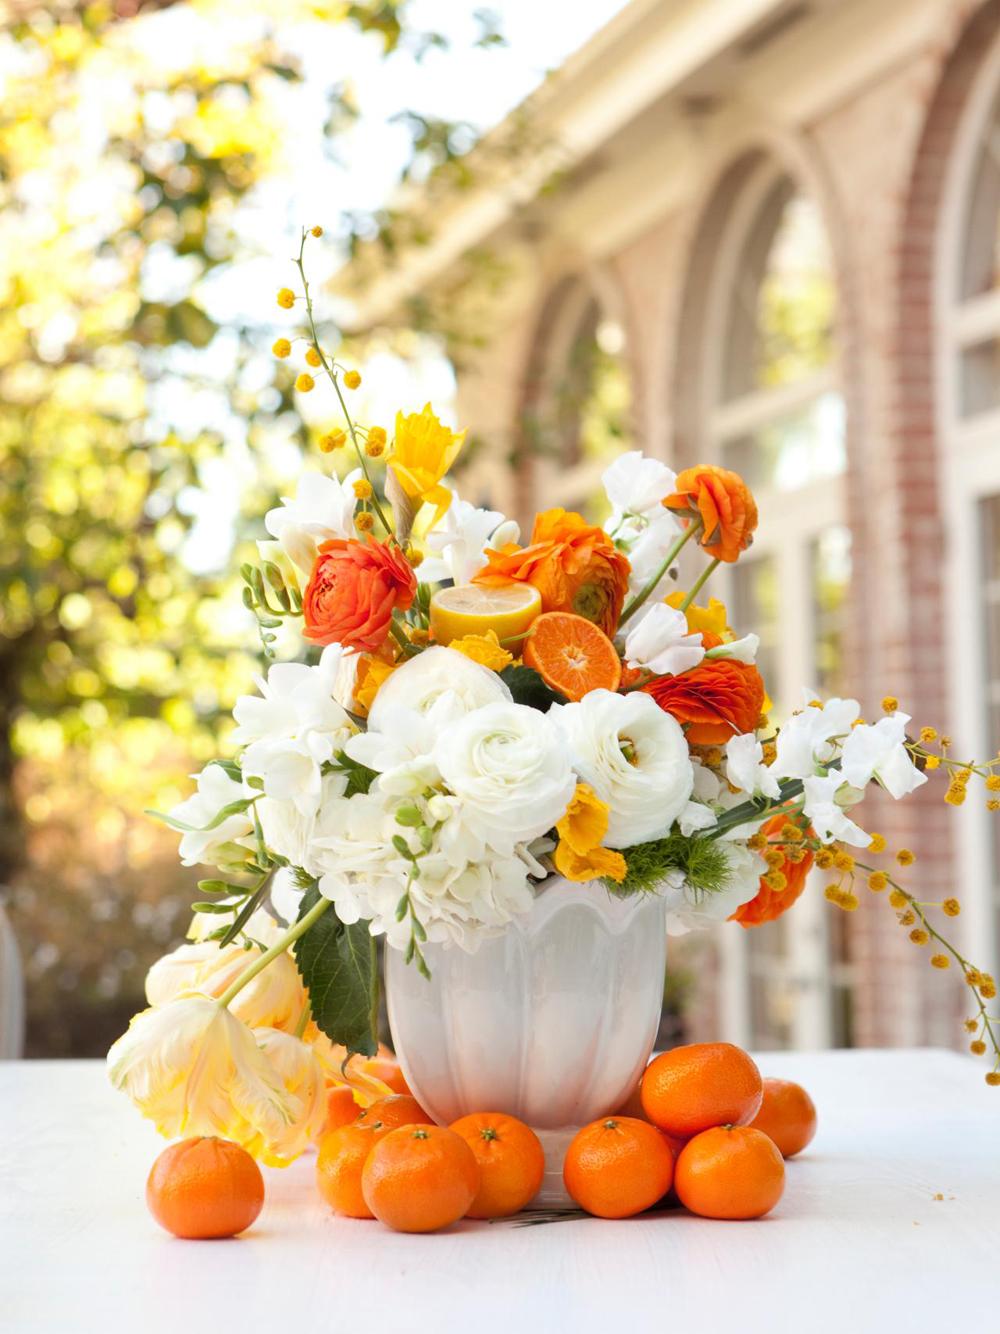 Easter Decorating in Orange